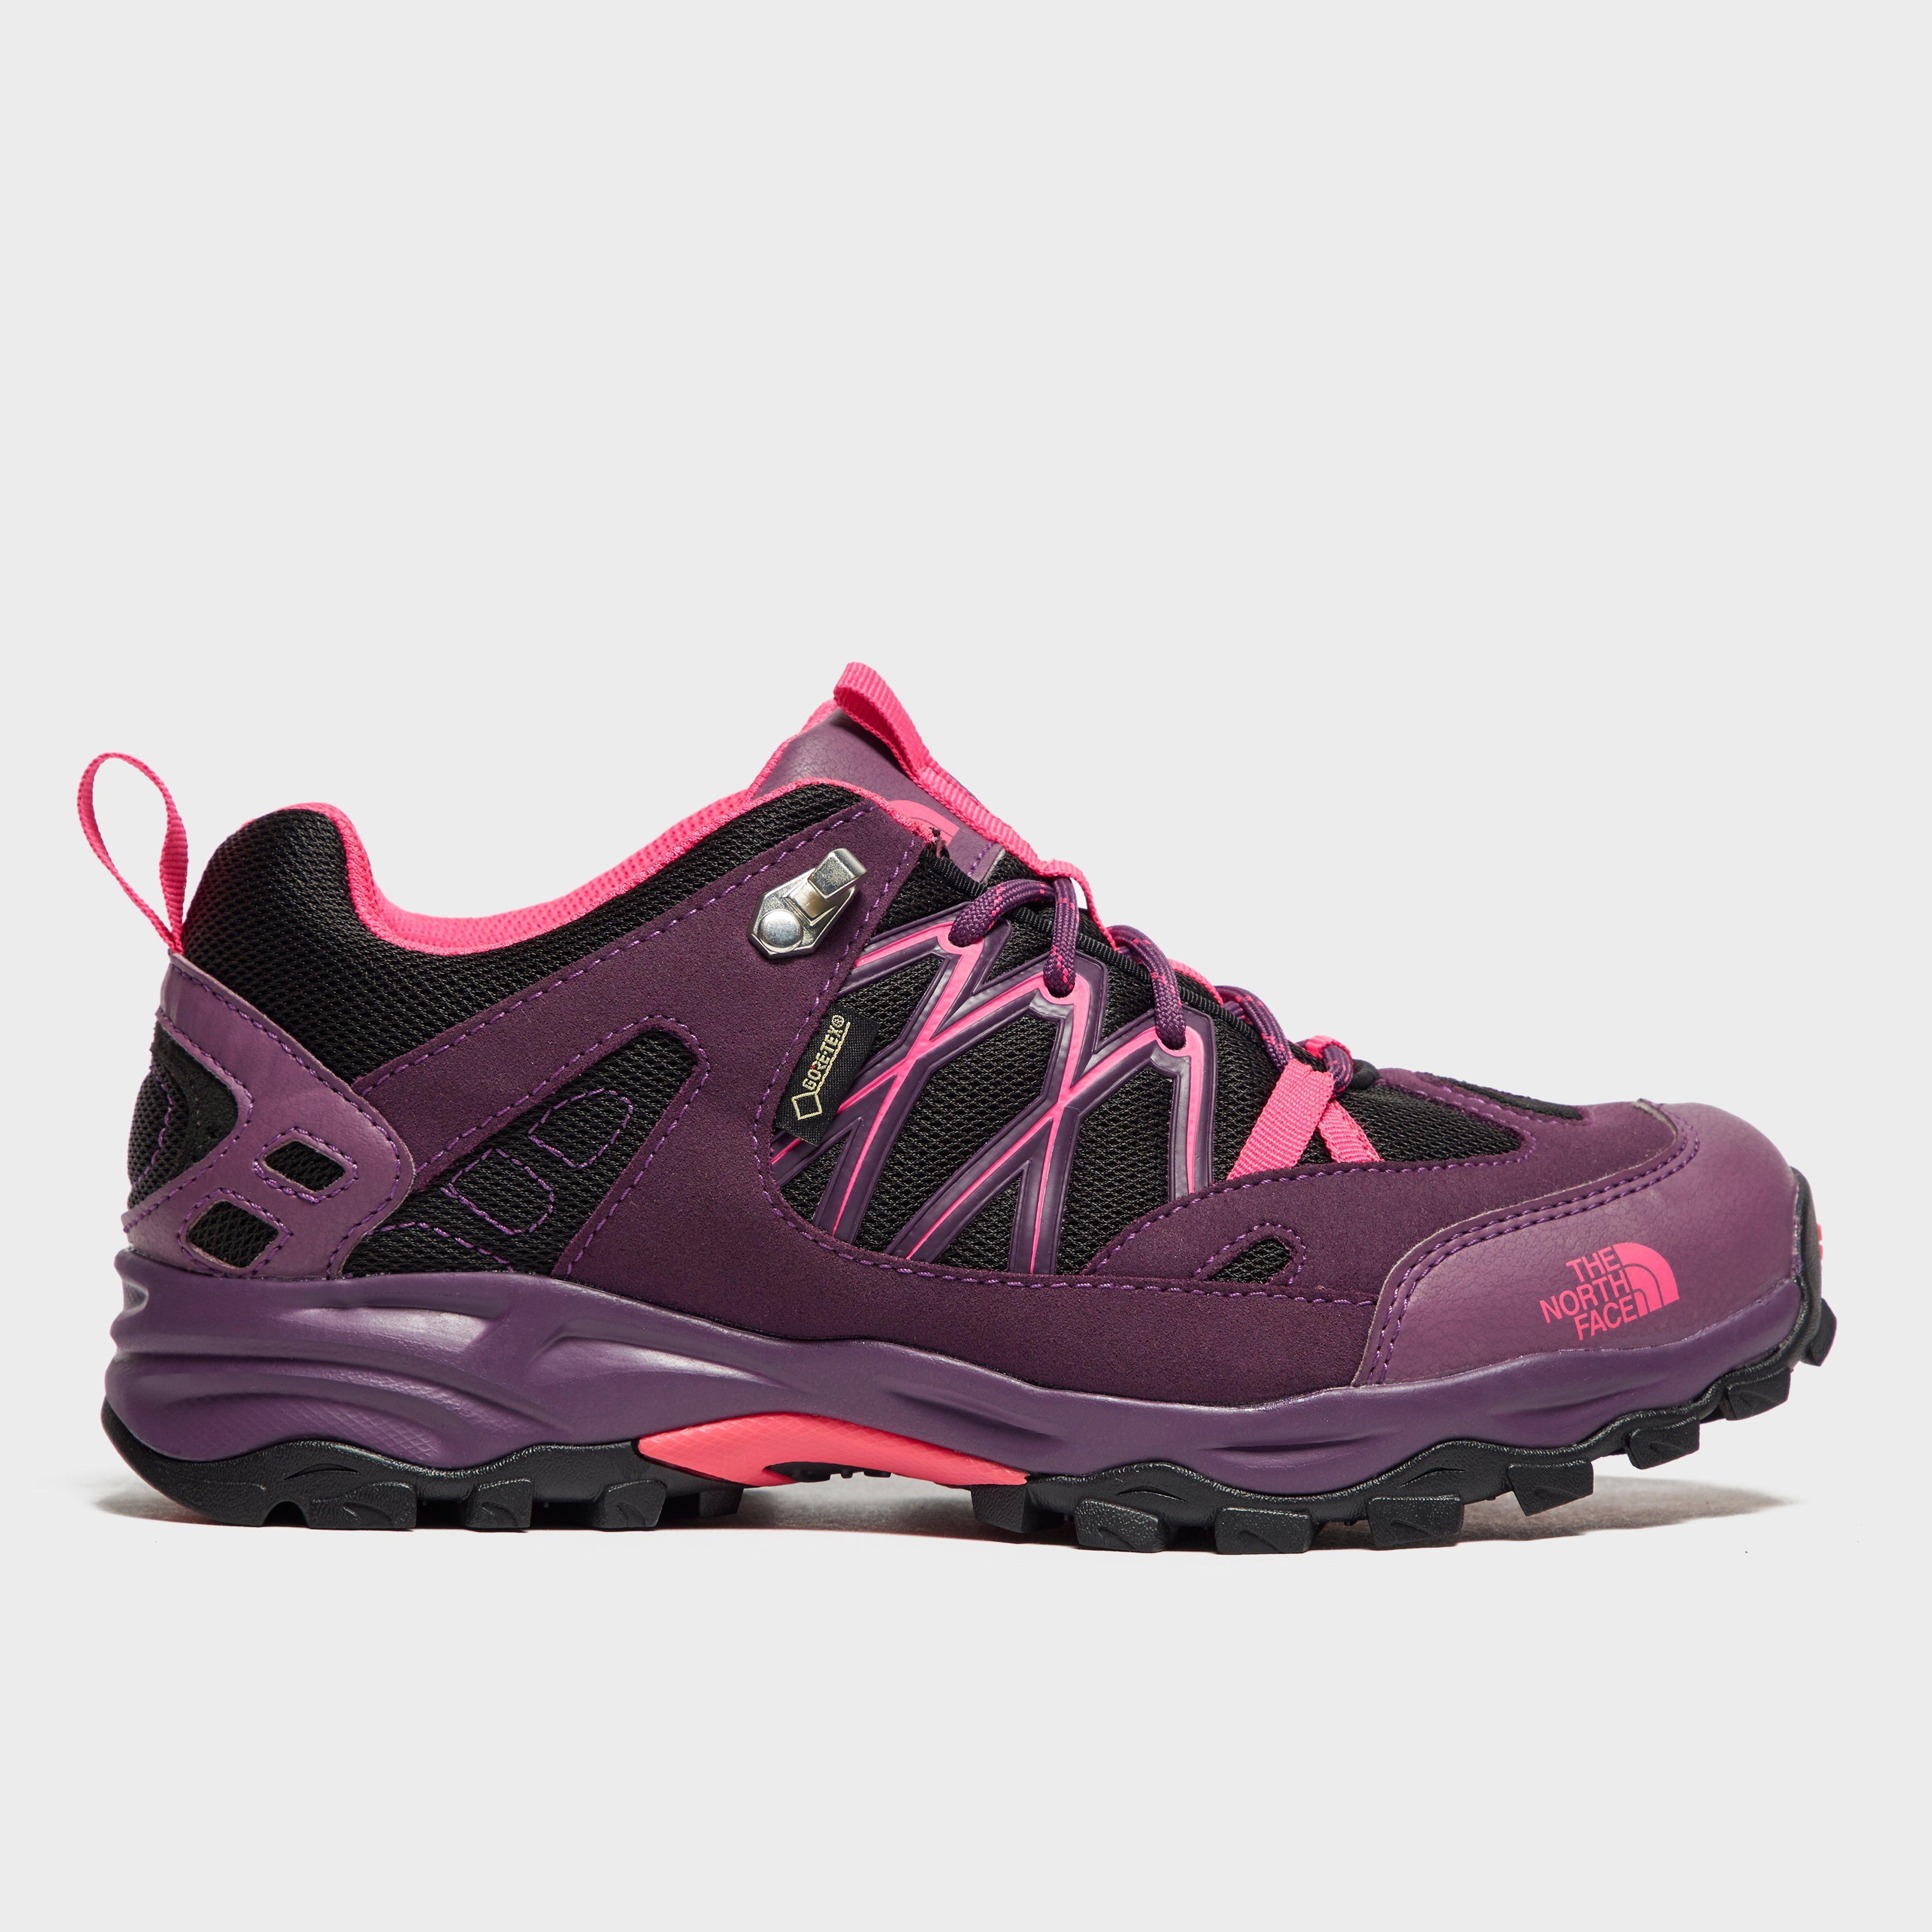 The North Face Women's Terra GORE-TEX Shoe - Purple, Purple Review thumbnail